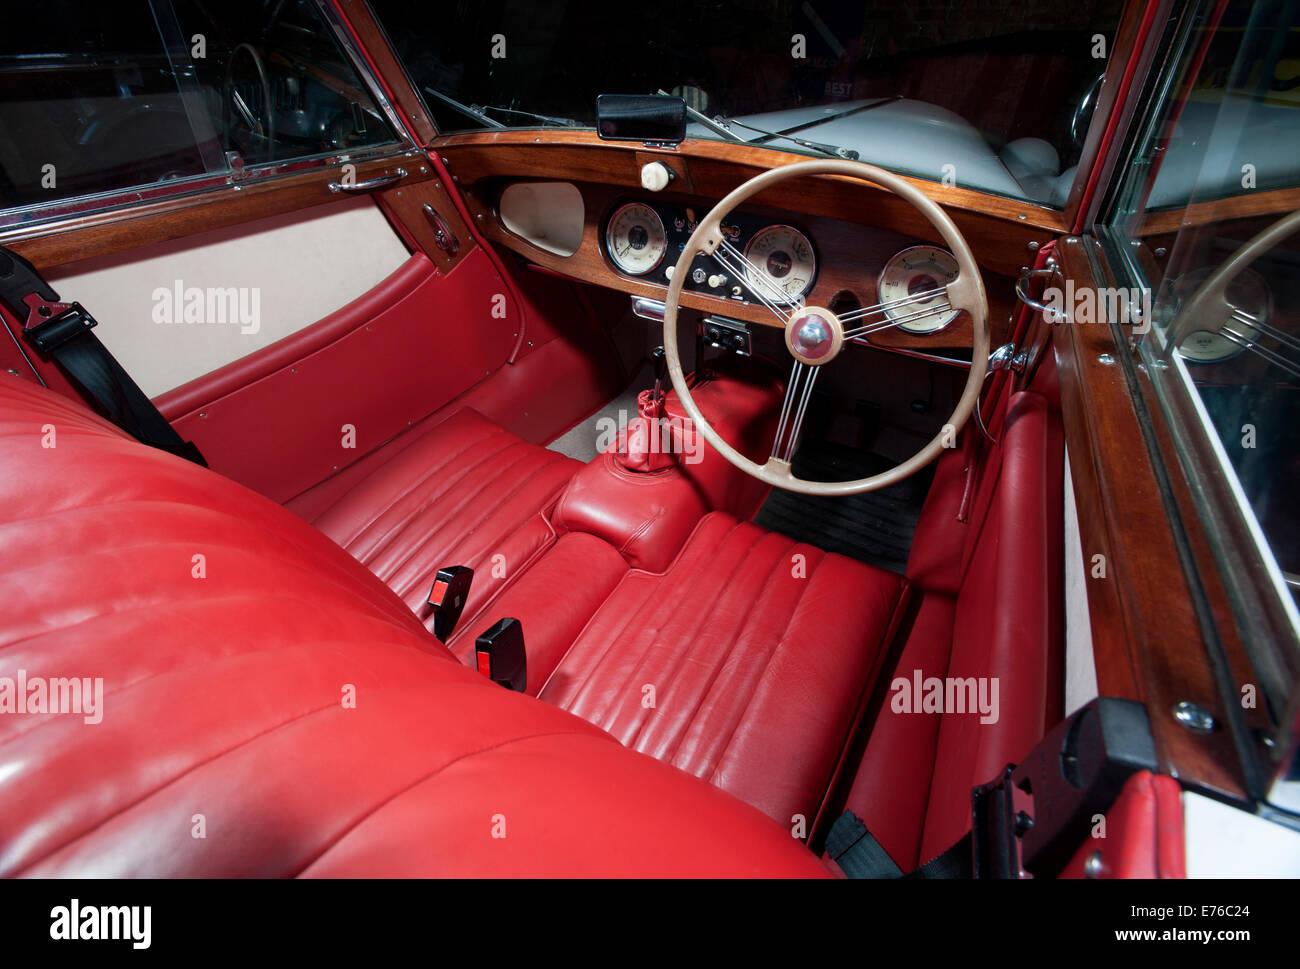 Morgan Plus 4 klassischen britischen Sportwagen Interieur Stockfoto ...